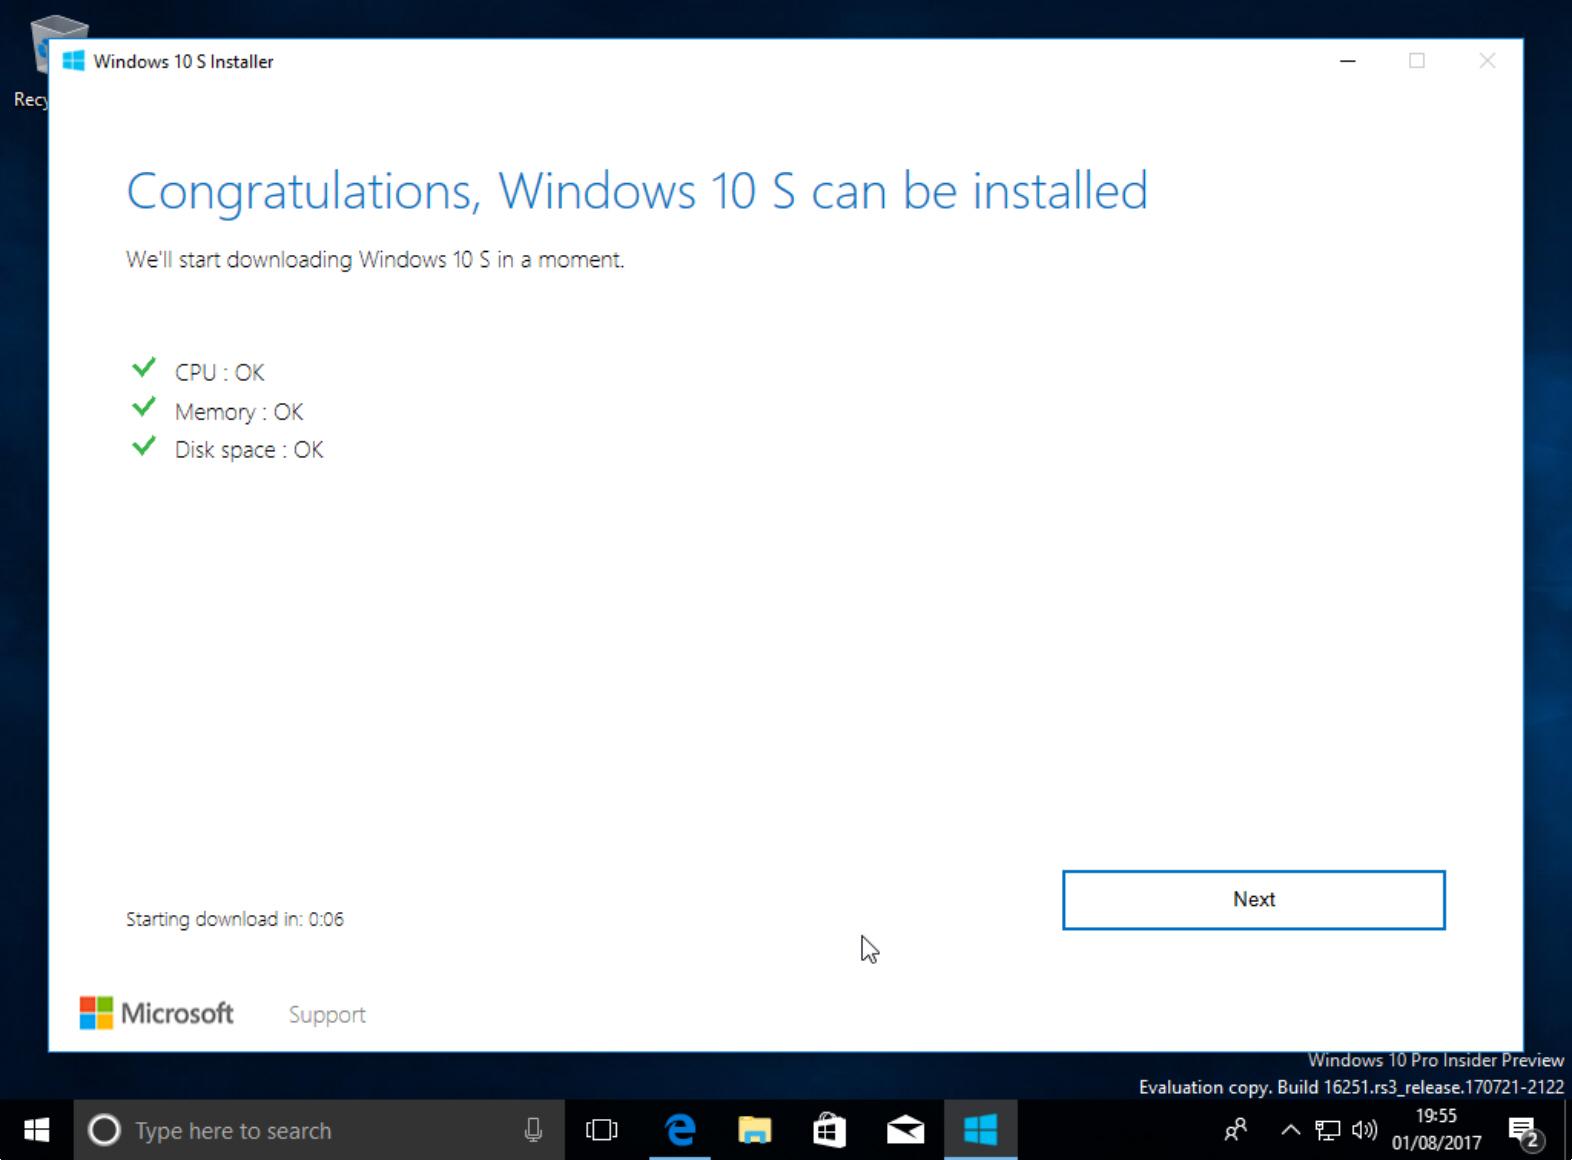 Win10 S installer